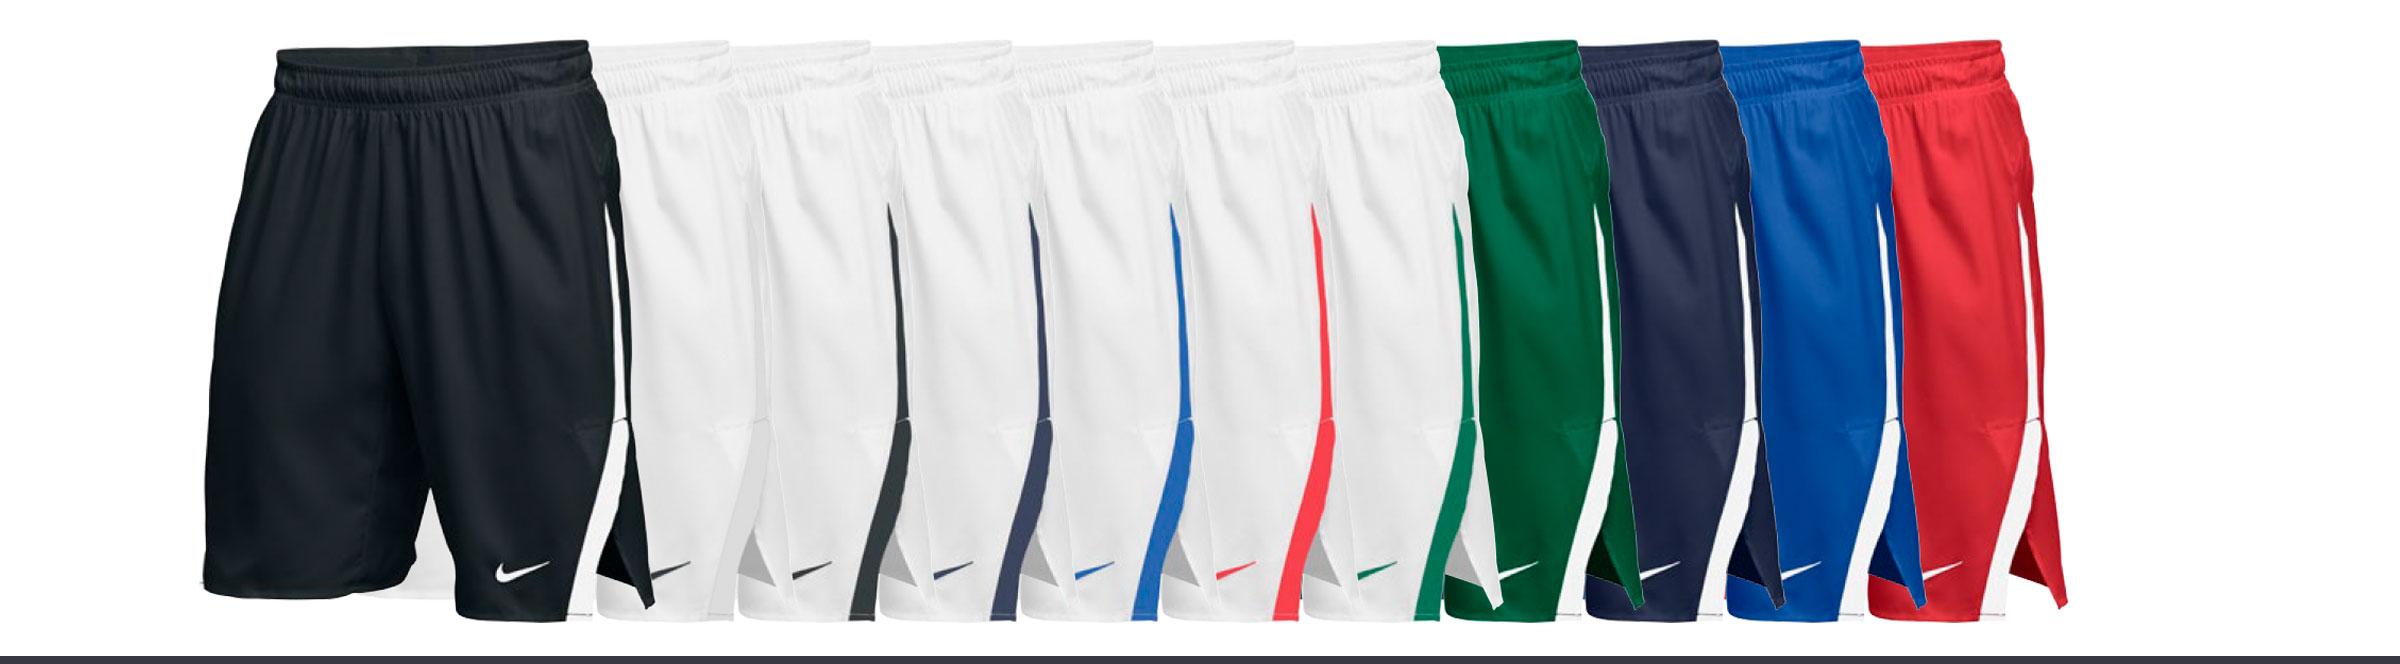 Custom Nike Untouchable Speed Lacrosse Shorts